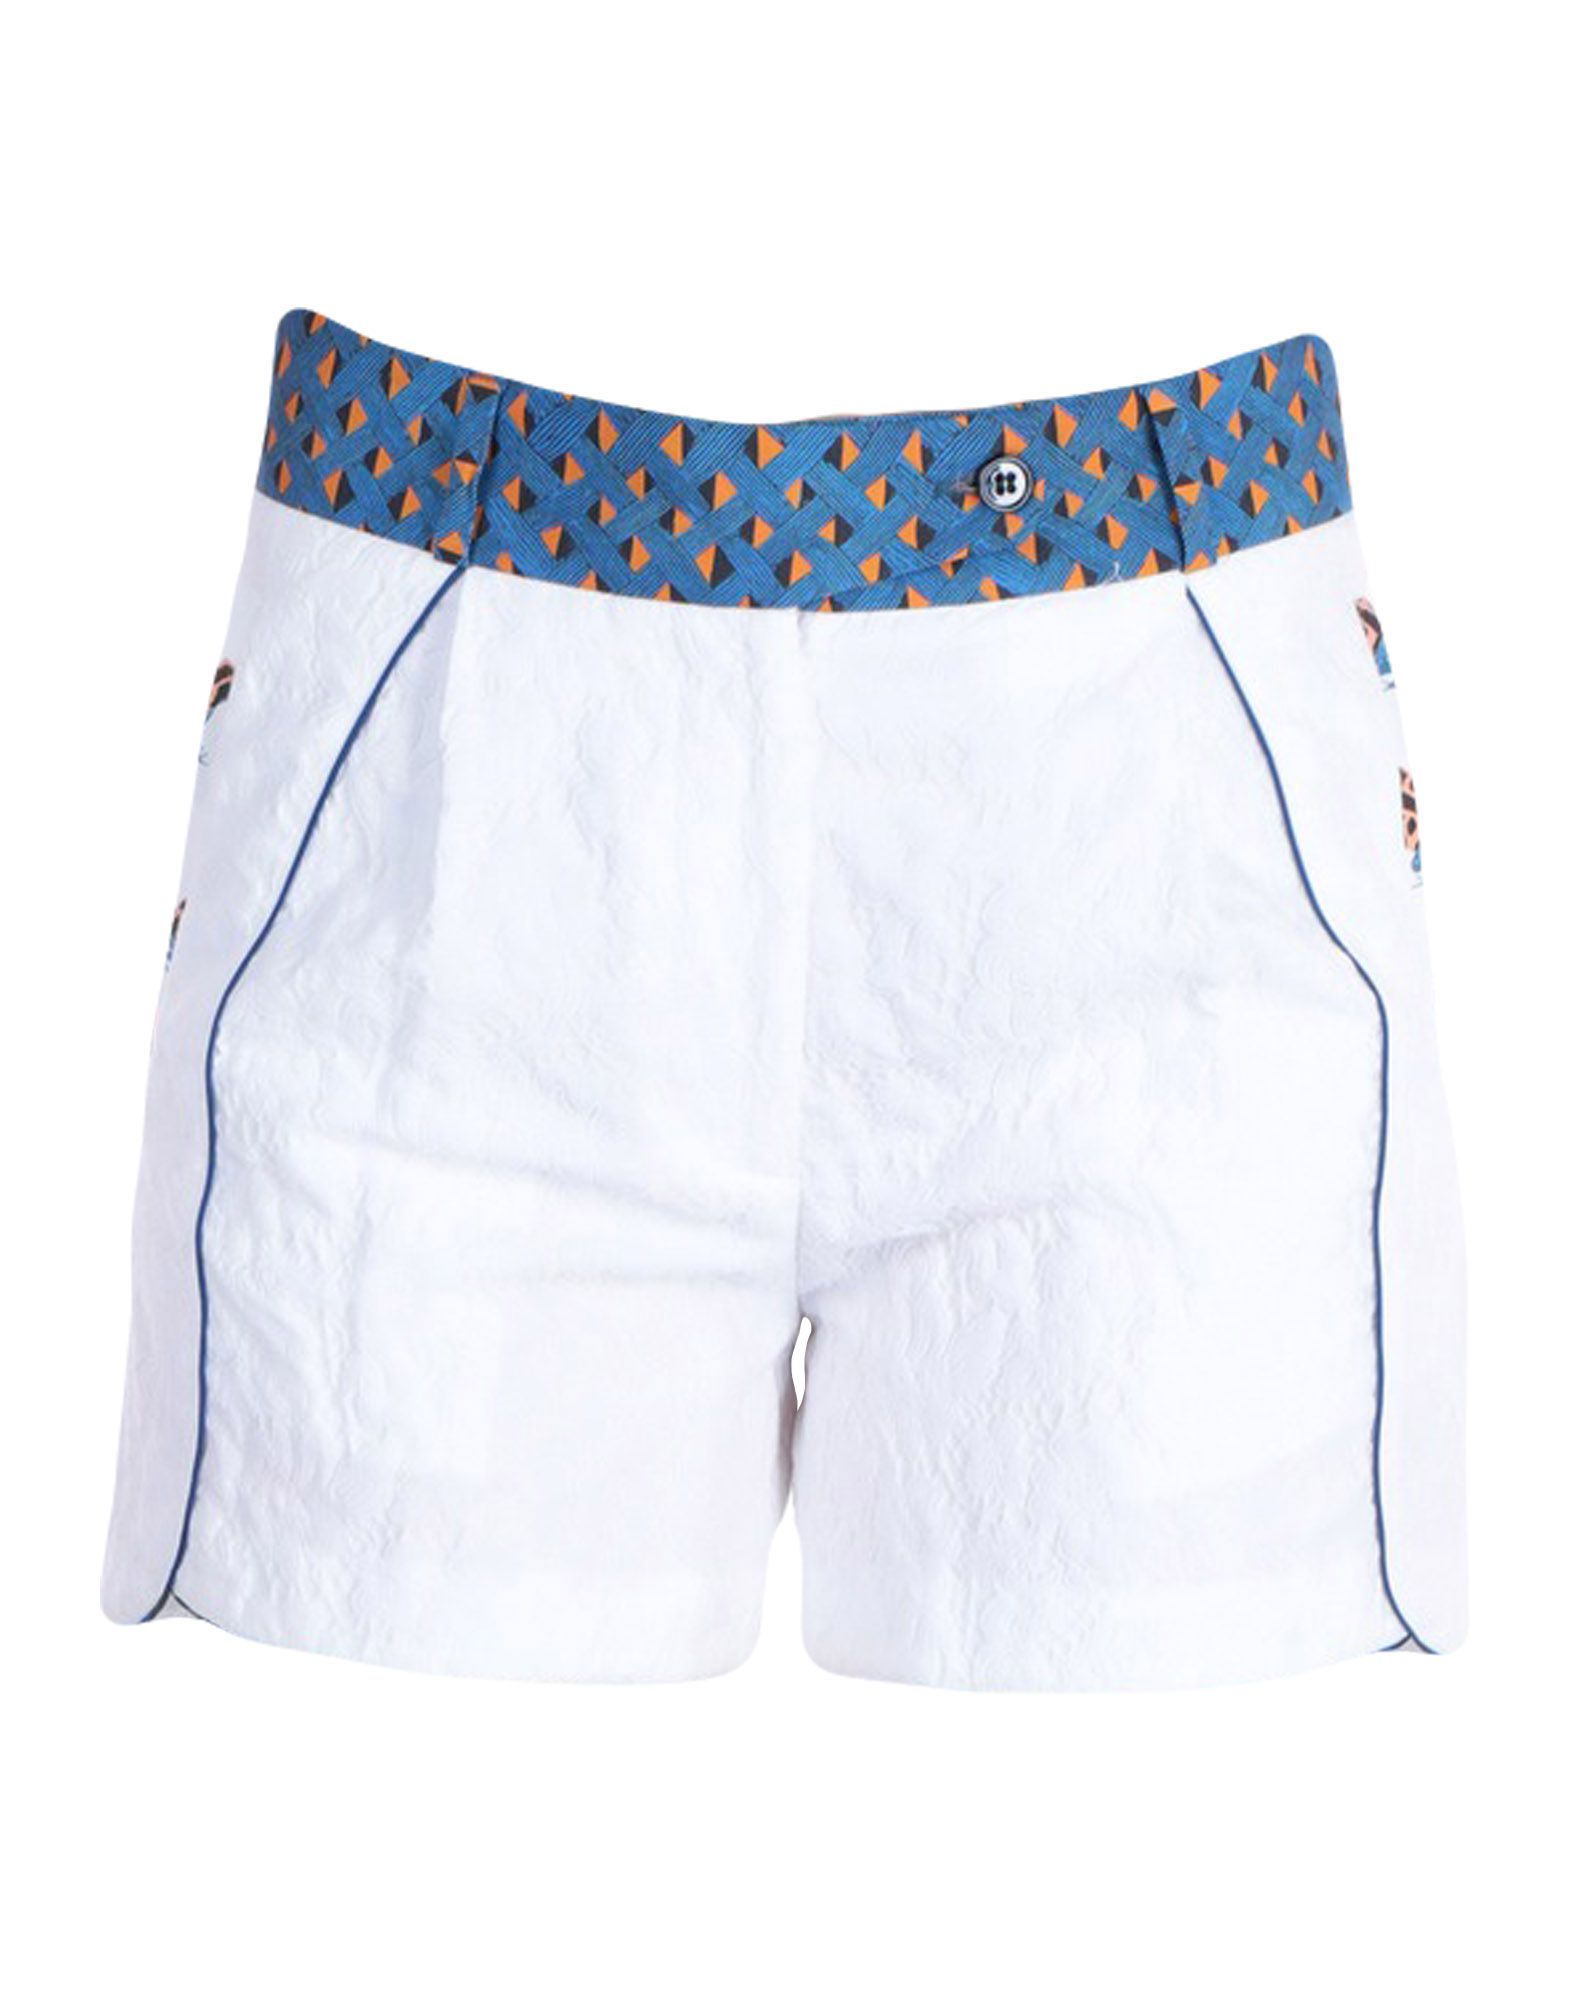 MAURO GRIFONI Повседневные шорты mauro grifoni шорты для плавания